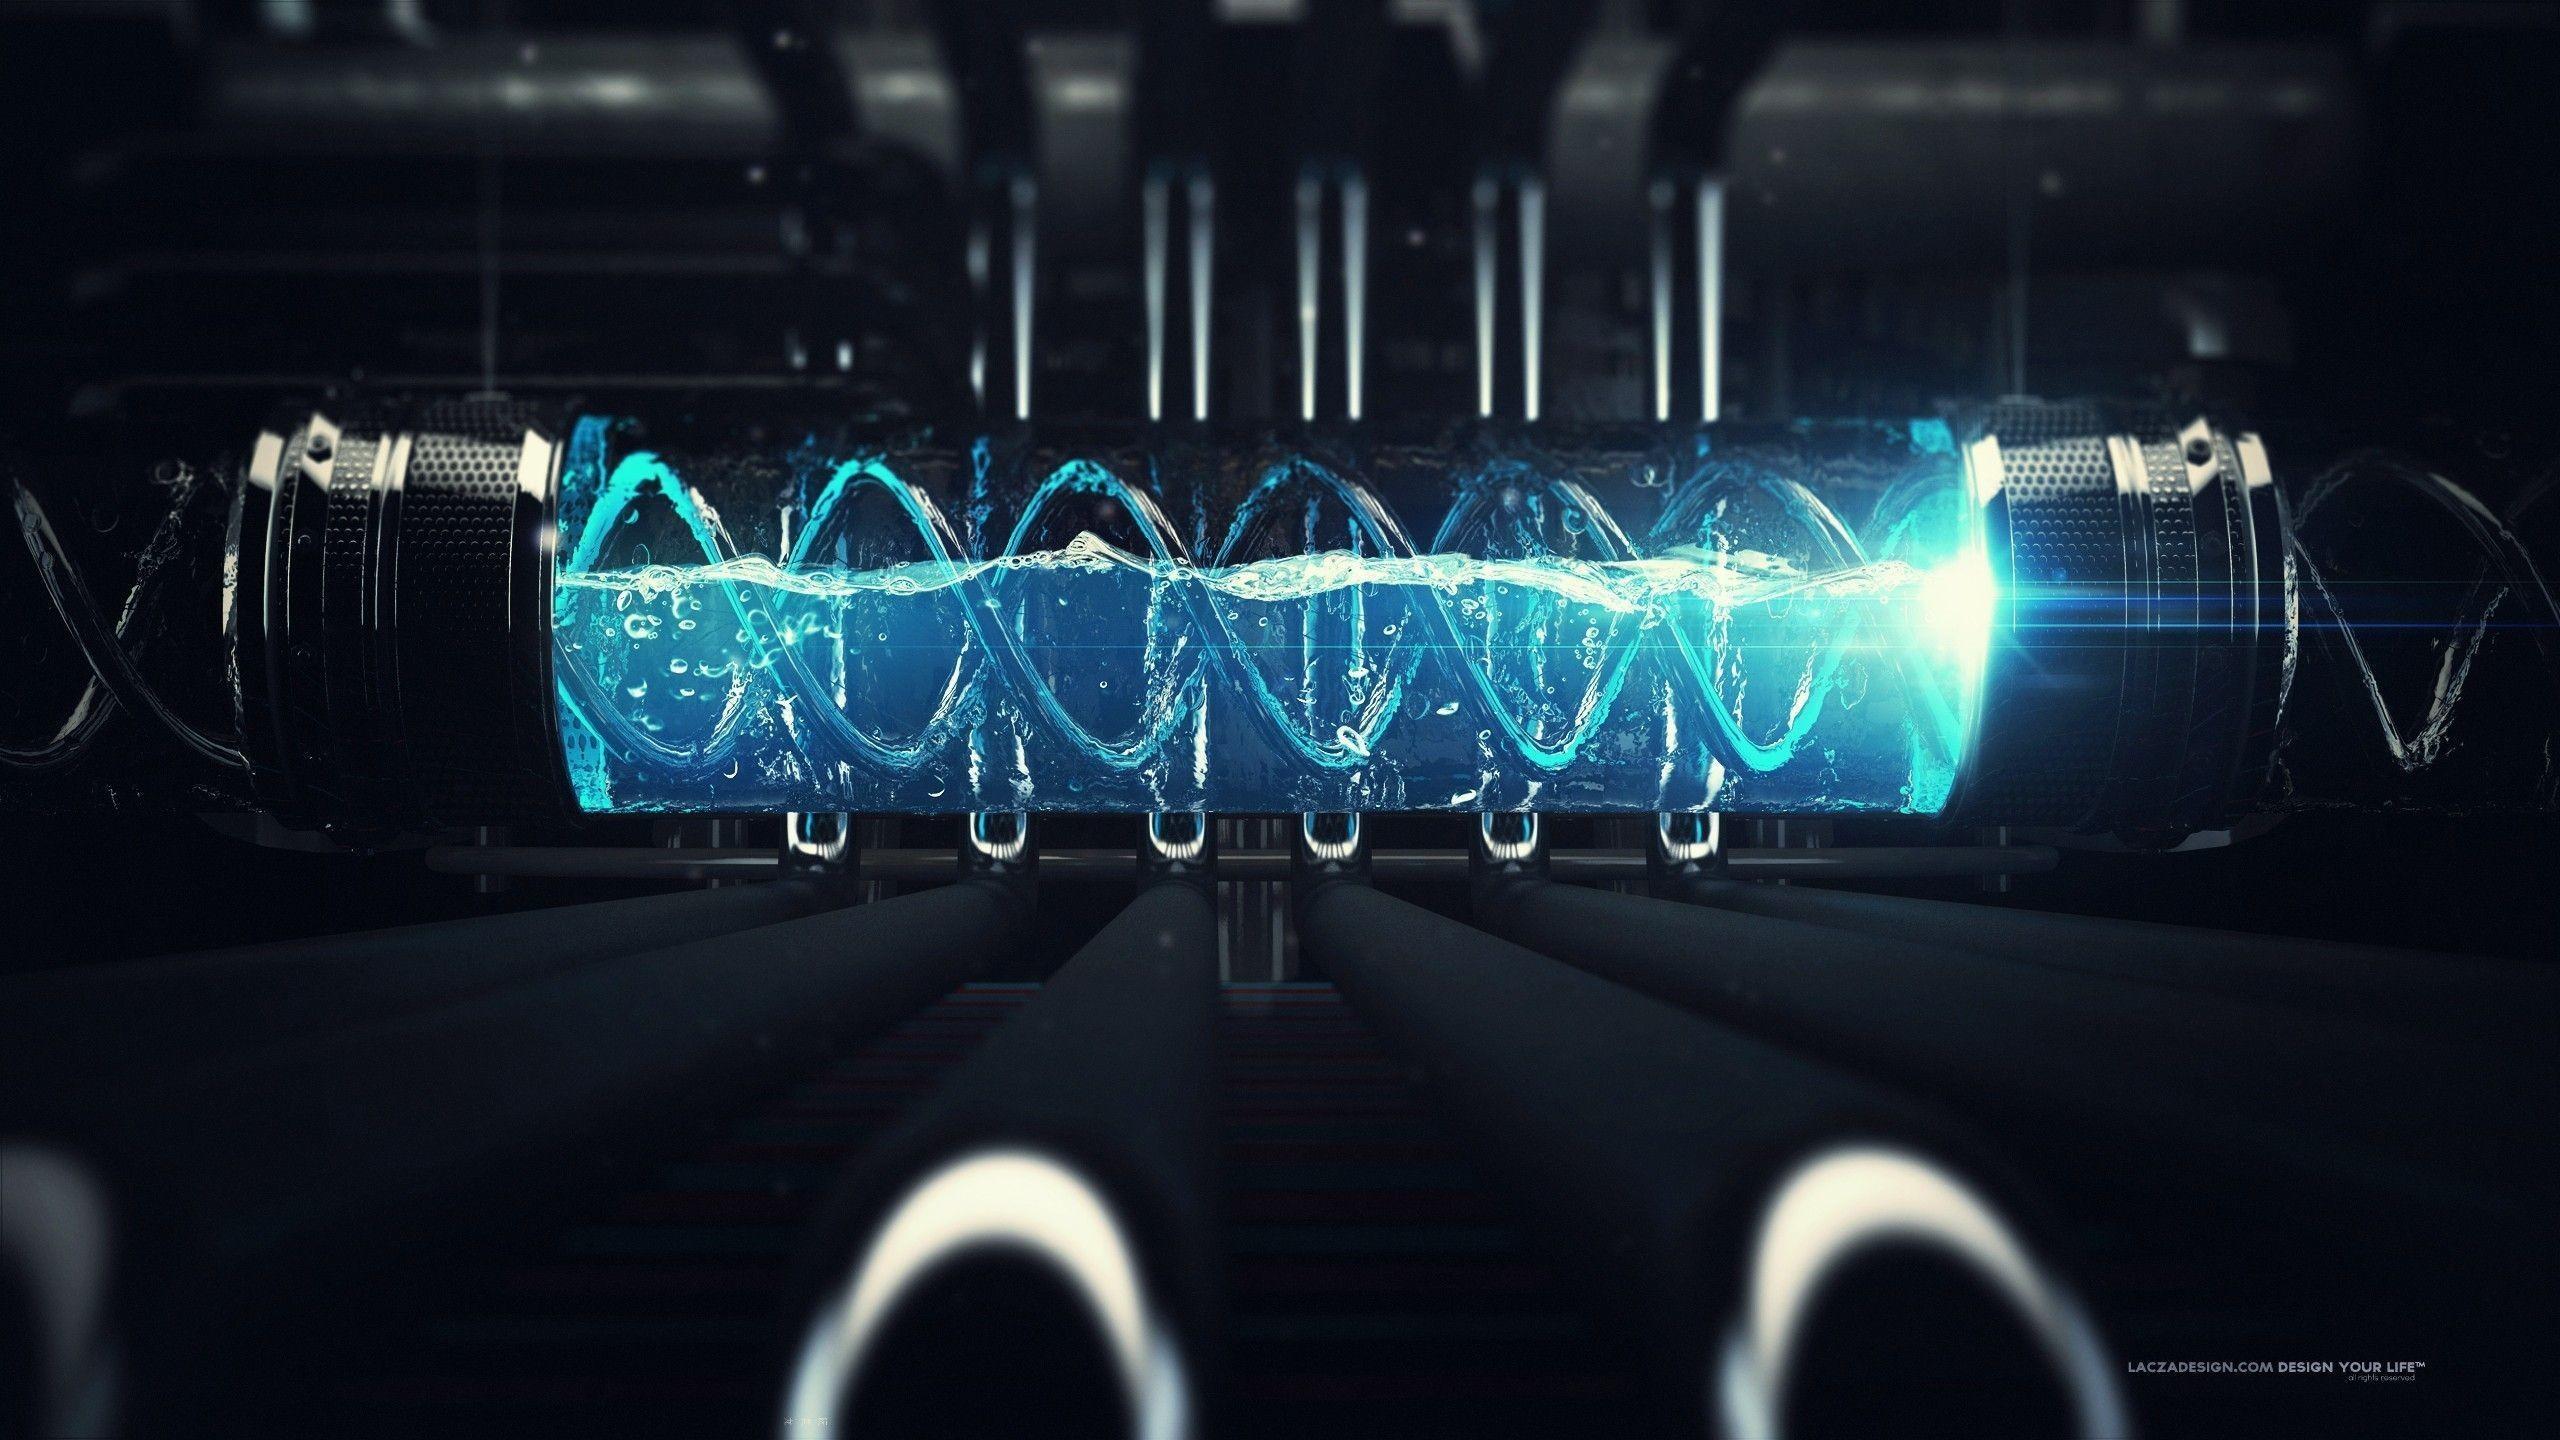 Futuristic Tech Wallpaper High Definition #c2k2 >